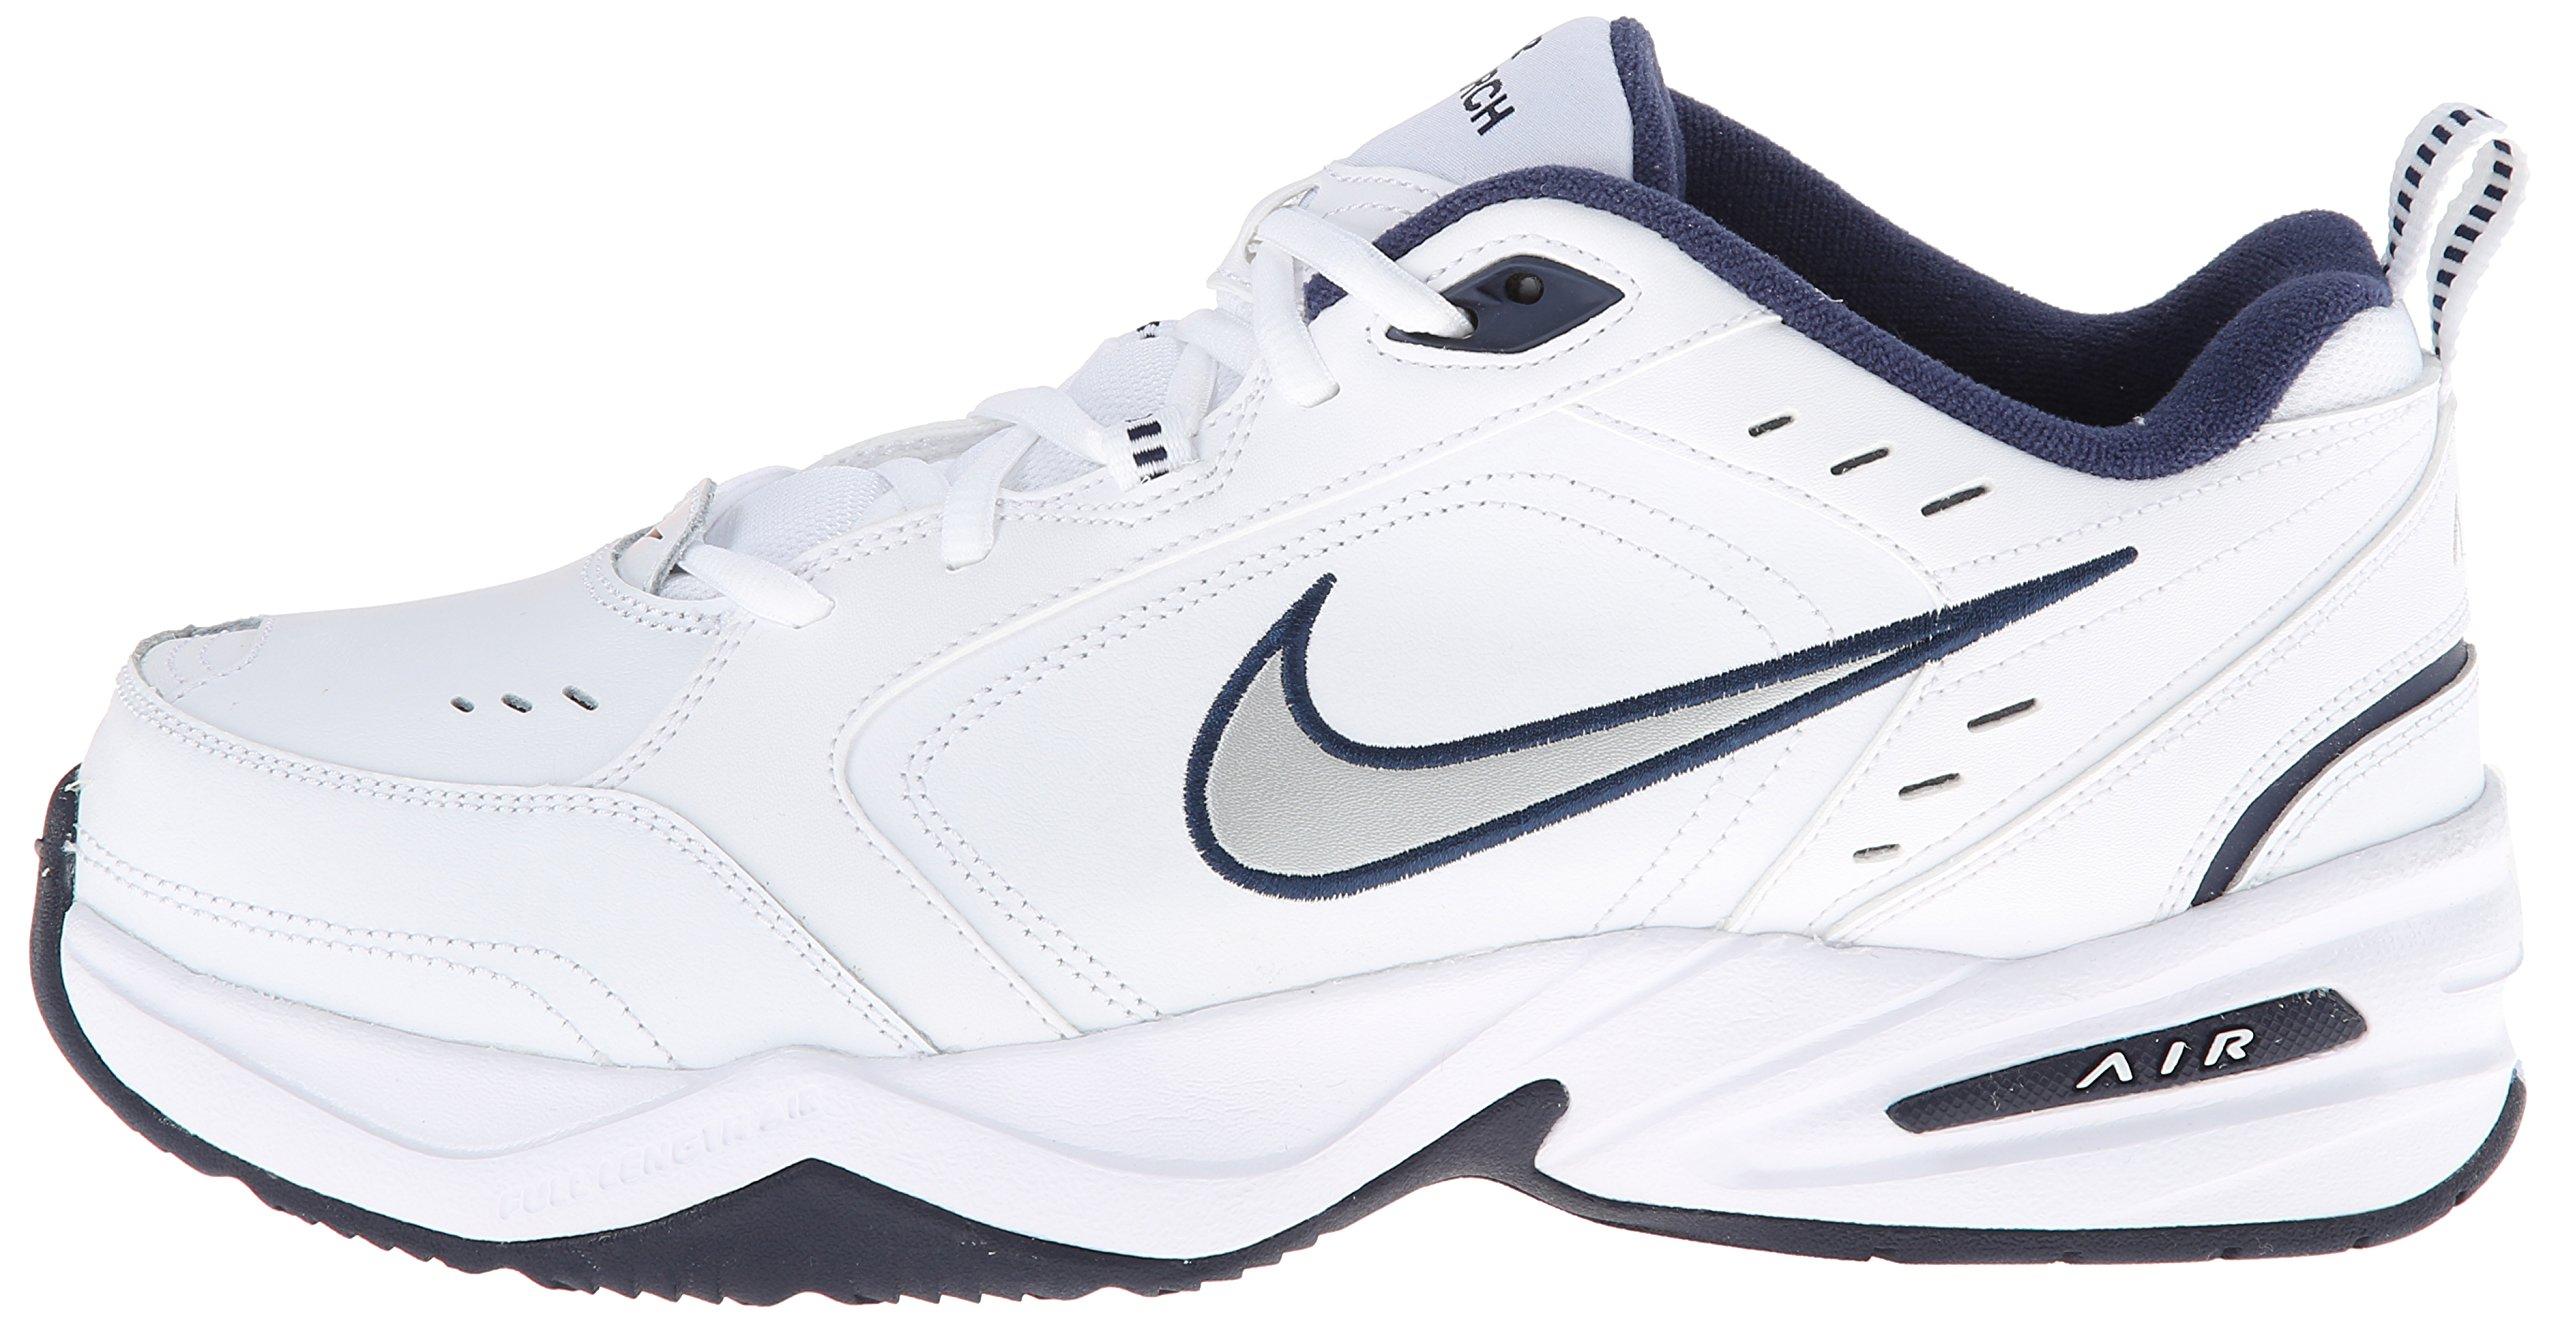 Nike-Men-039-s-Air-Monarch-IV-Cross-Trainer-Sneaker-416355 thumbnail 24